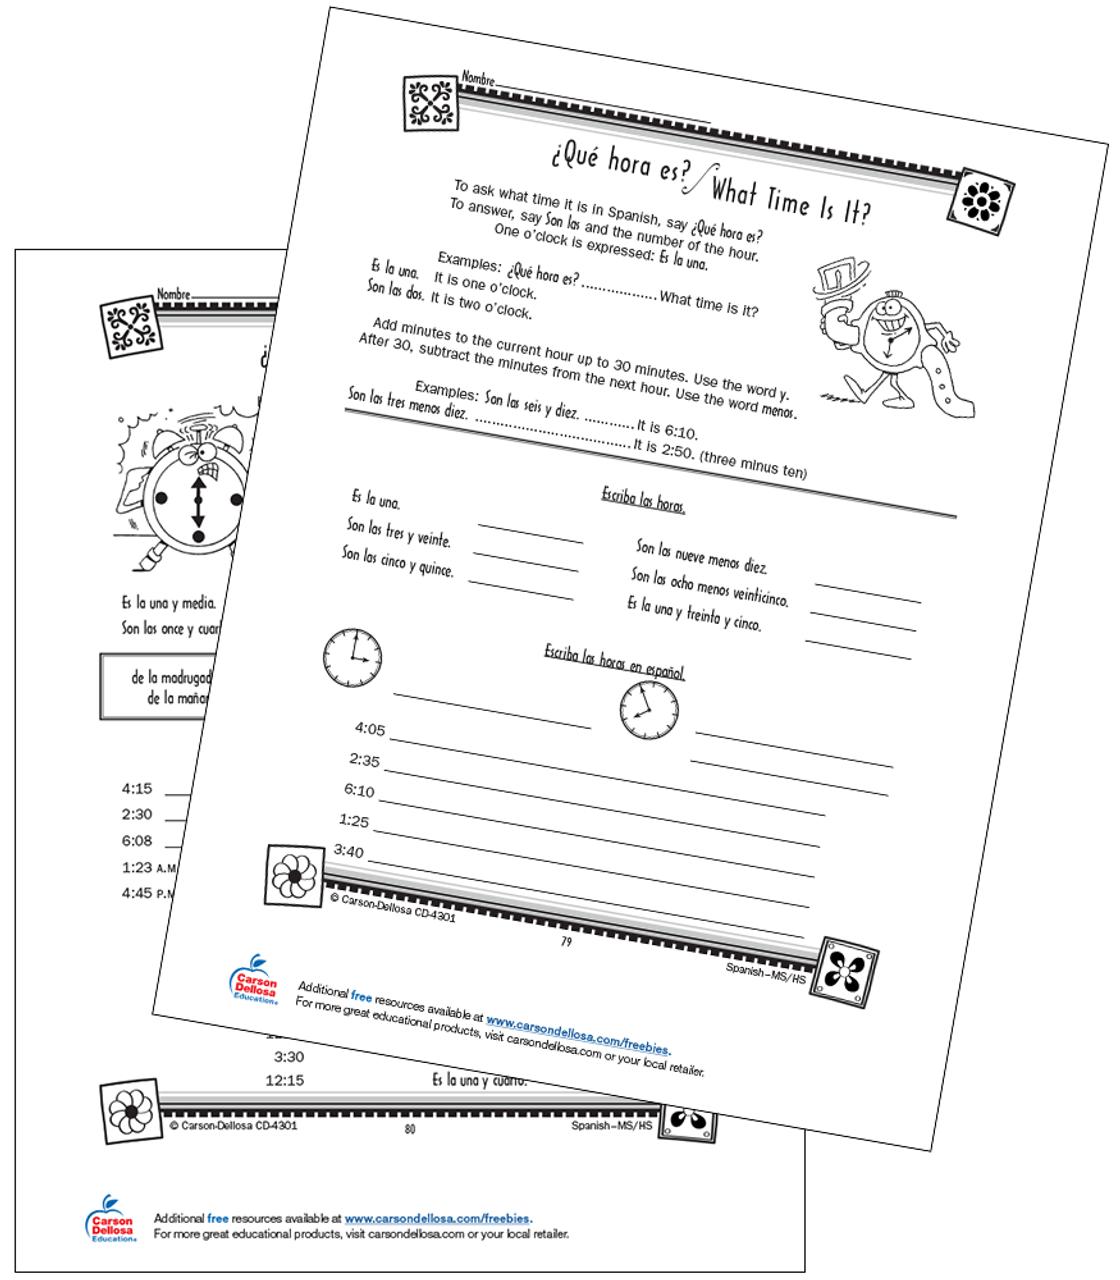 Time Vocabulary and Expressions Grade 6-12 Spanish Free Printable   Carson  Dellosa [ 1280 x 1120 Pixel ]